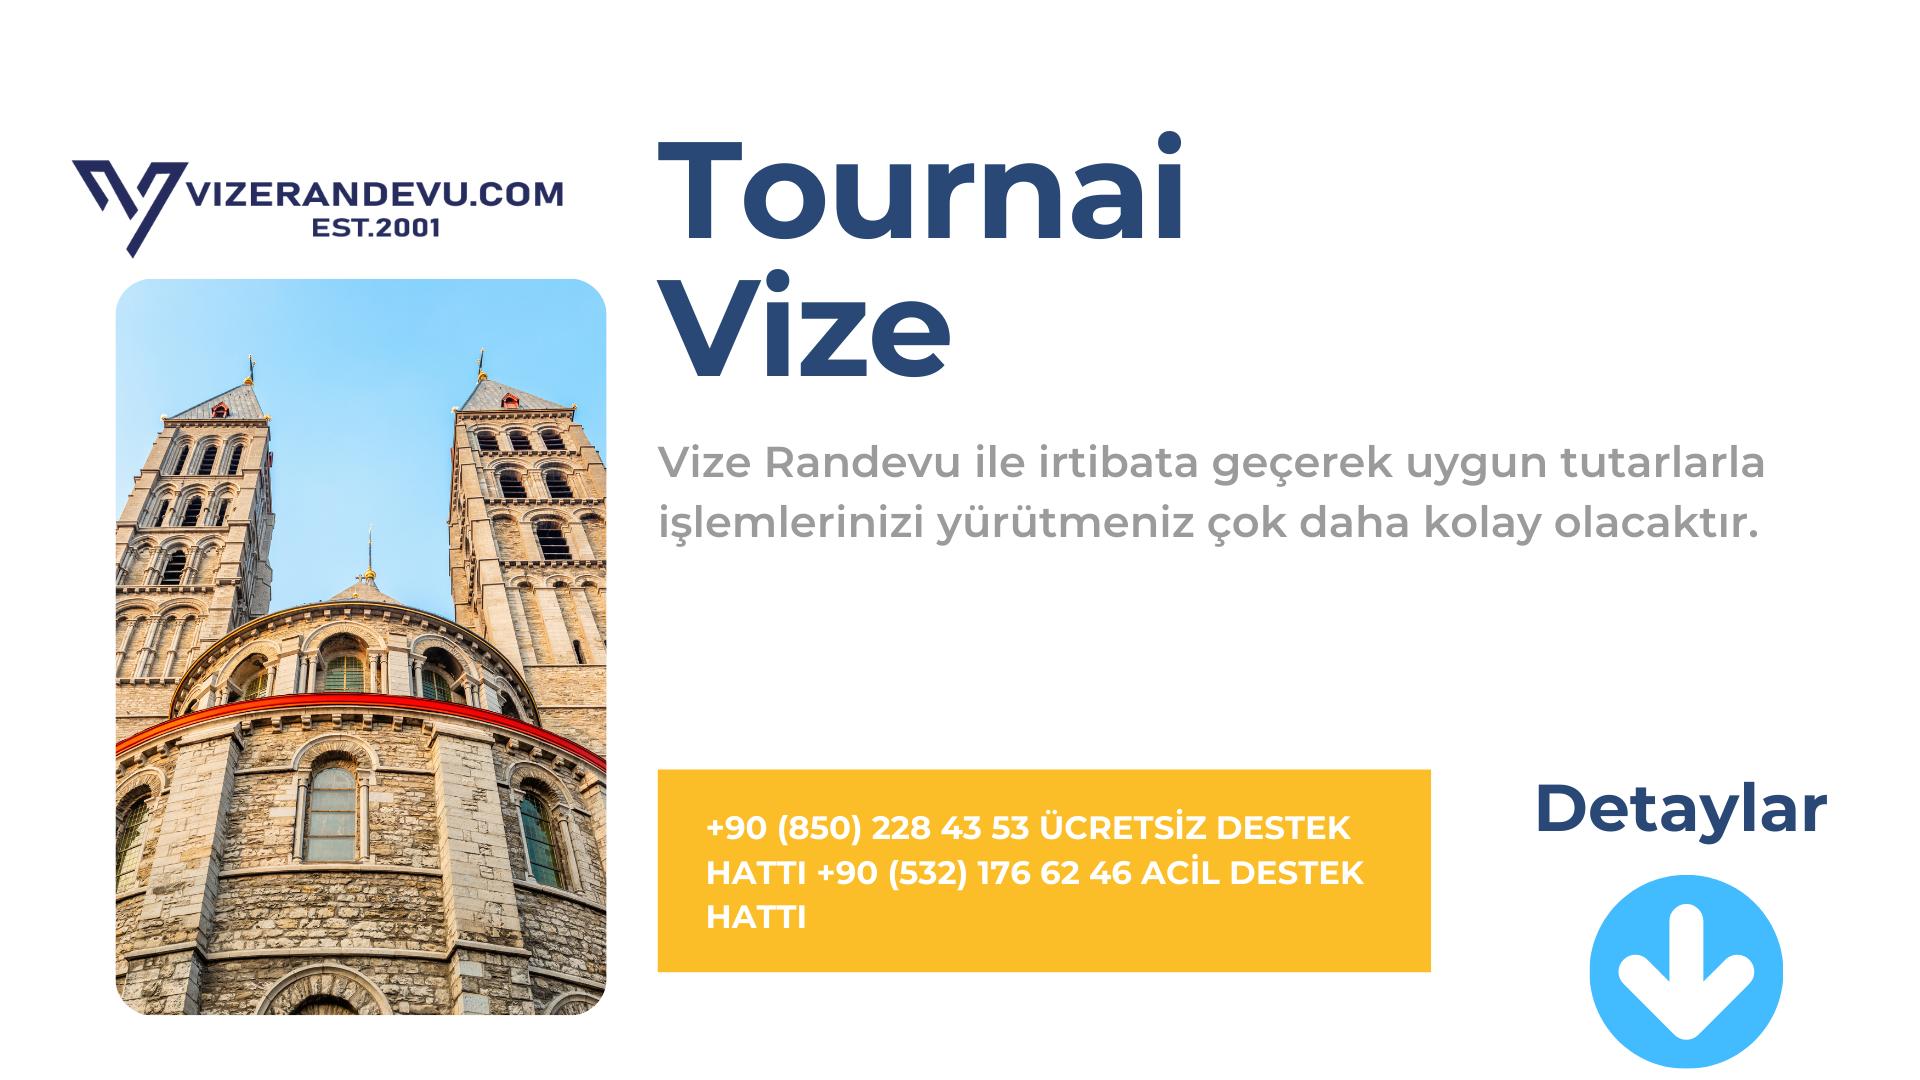 Tournai Vize